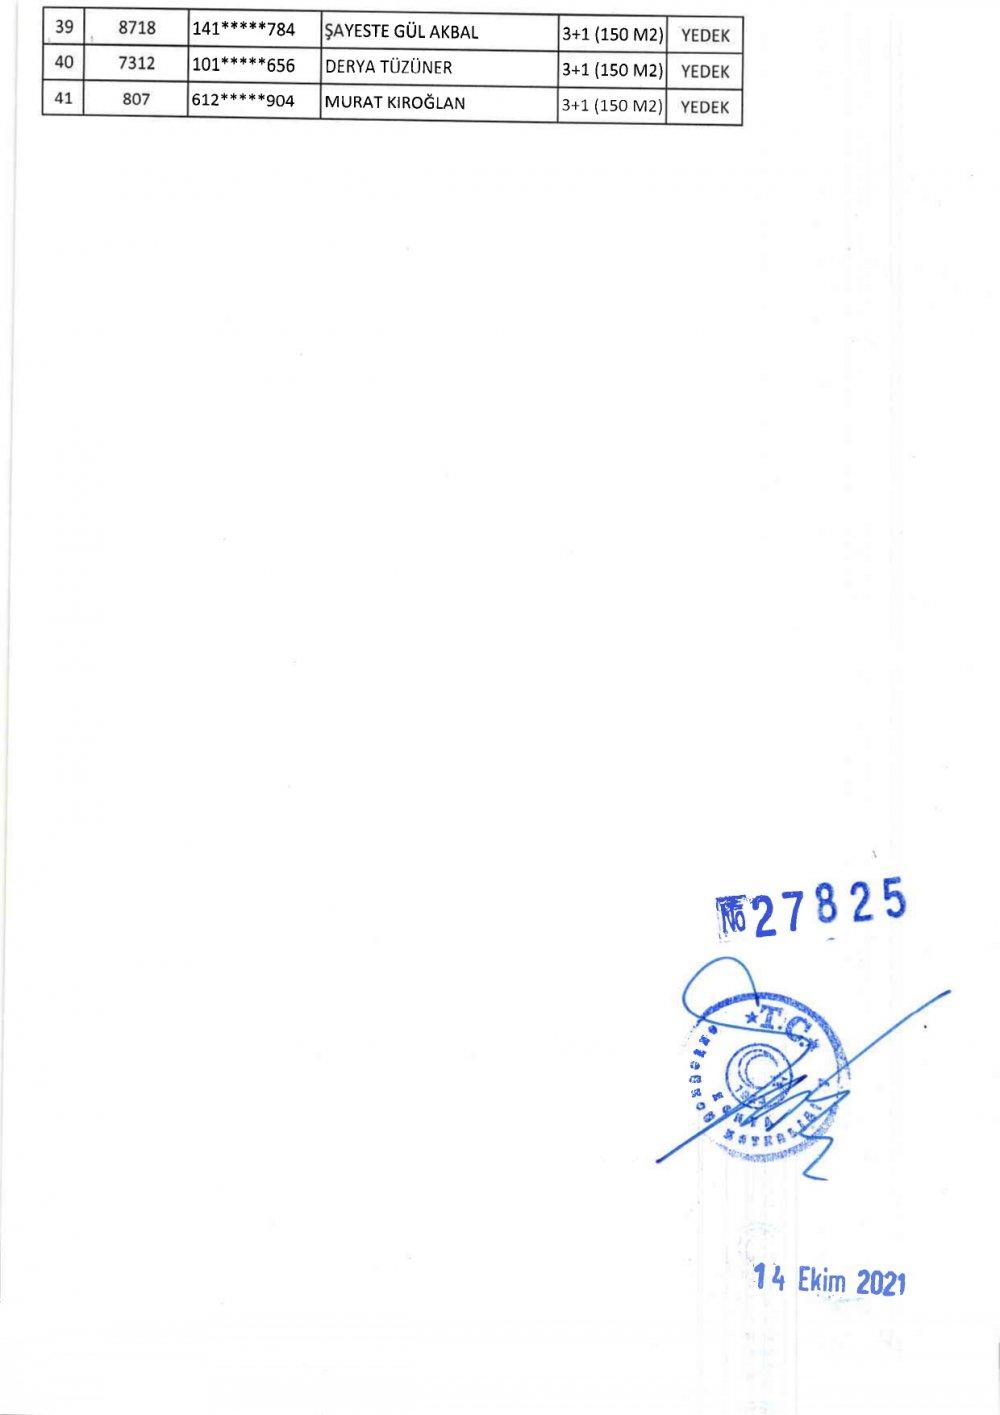 ss-turgutreis-evleri-kyk-kura-cekilis-listesi-page-0010.jpg